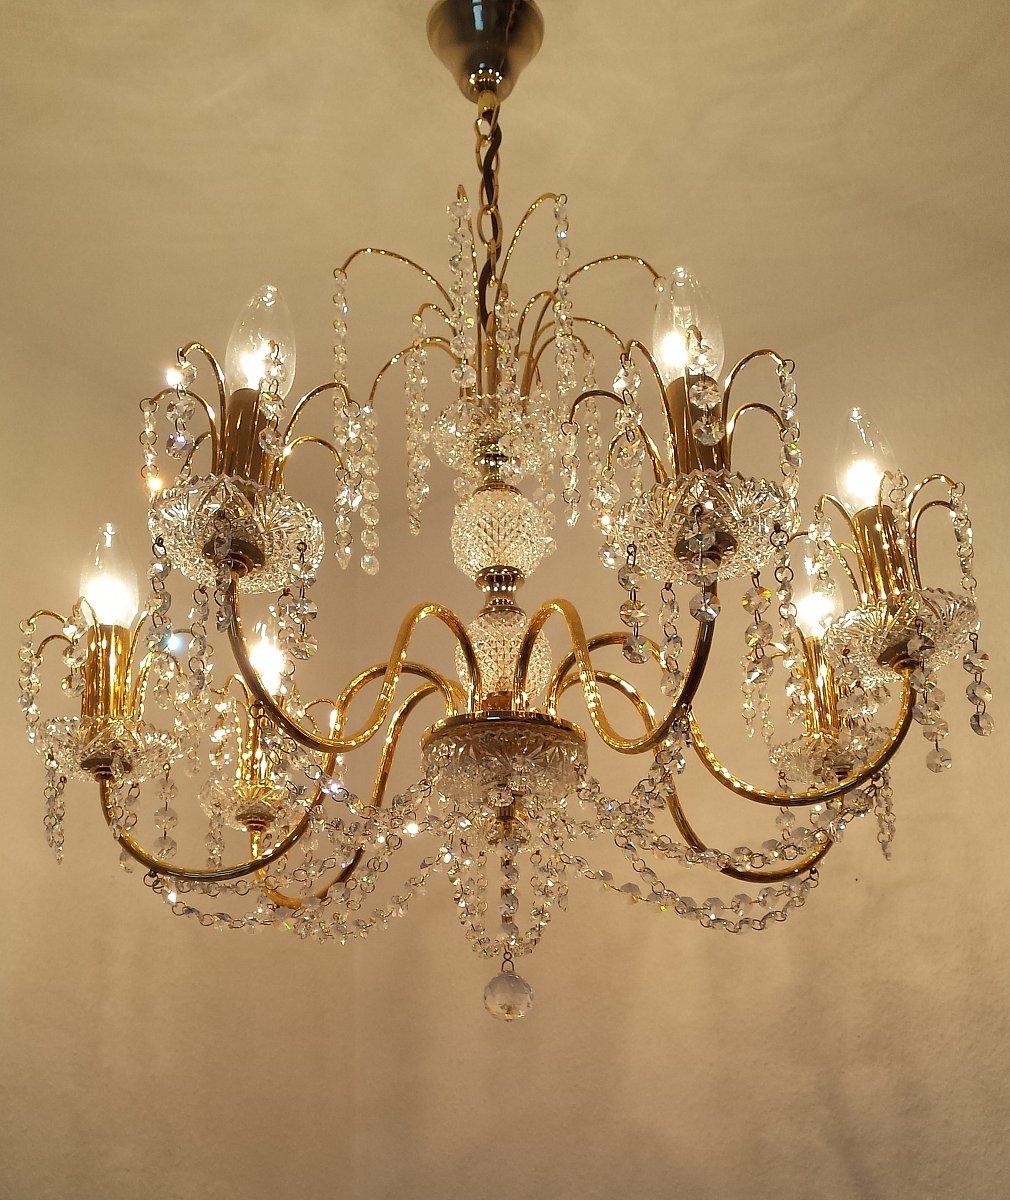 kristalll ster kristall l ster s lken leuchten. Black Bedroom Furniture Sets. Home Design Ideas